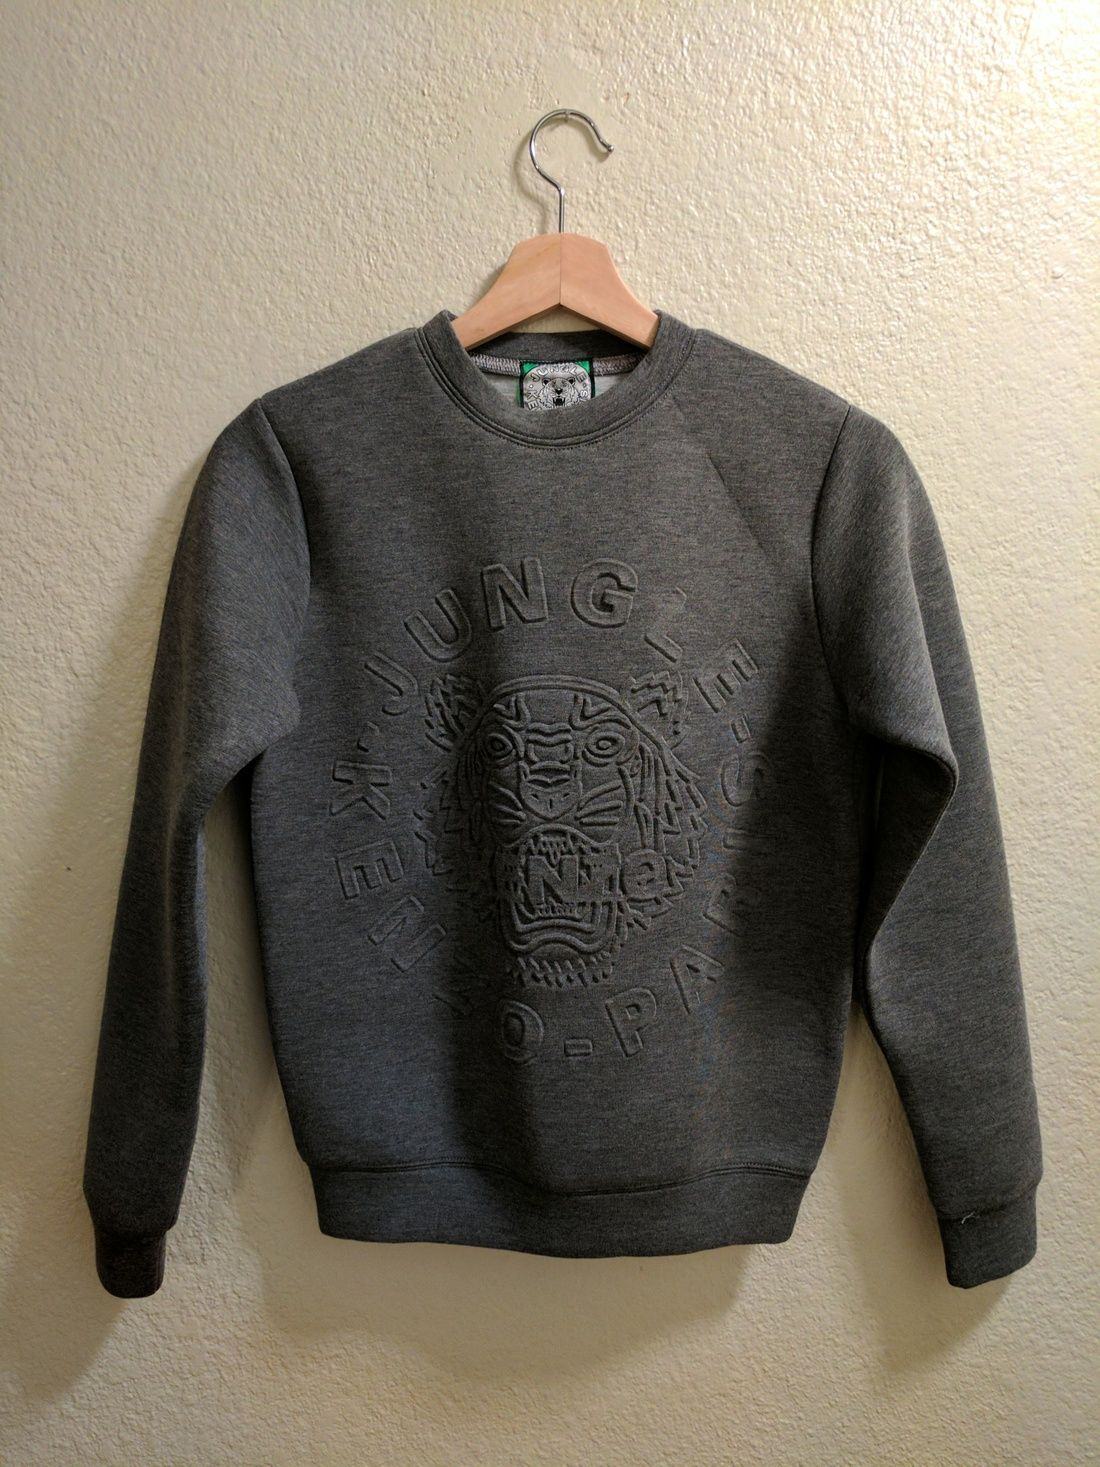 0607450dab83 Kenzo Gray Tiger Embossed Crewneck Sweatshirt Size S  99 - Grailed